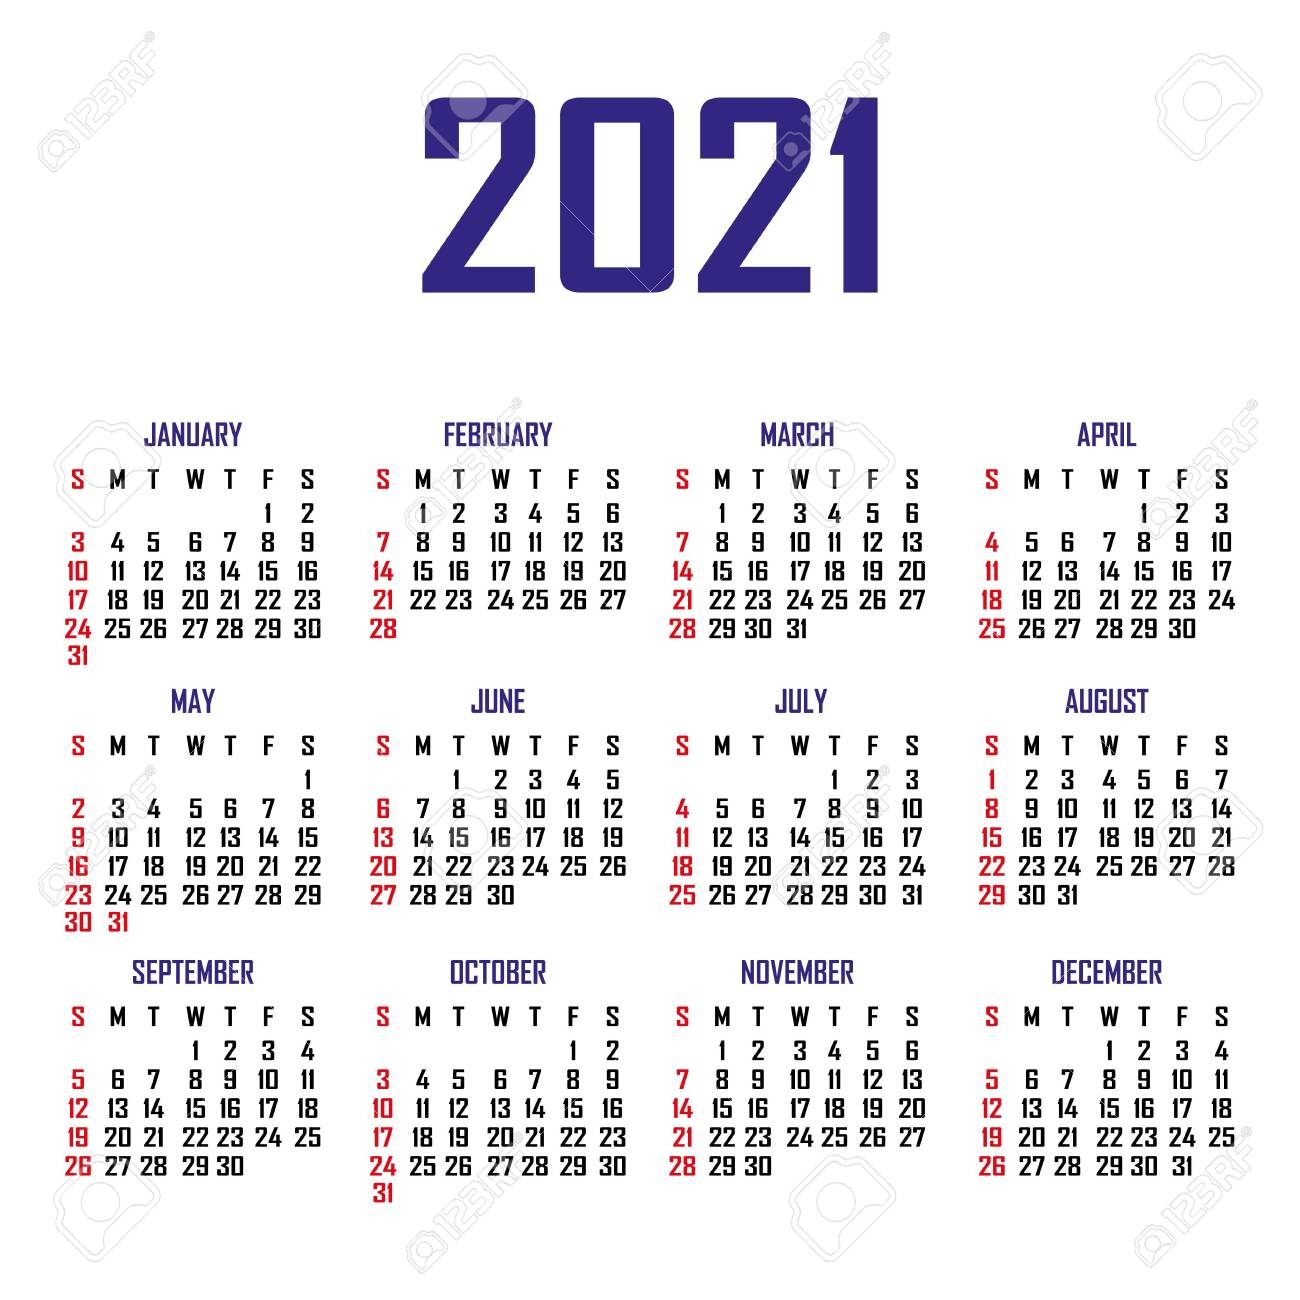 Calendar 2021. The week begins on Sunday. Simple calendar template. Portrait of vertical orientation. Annual organizer of stationery. Vector illustration - 152584215